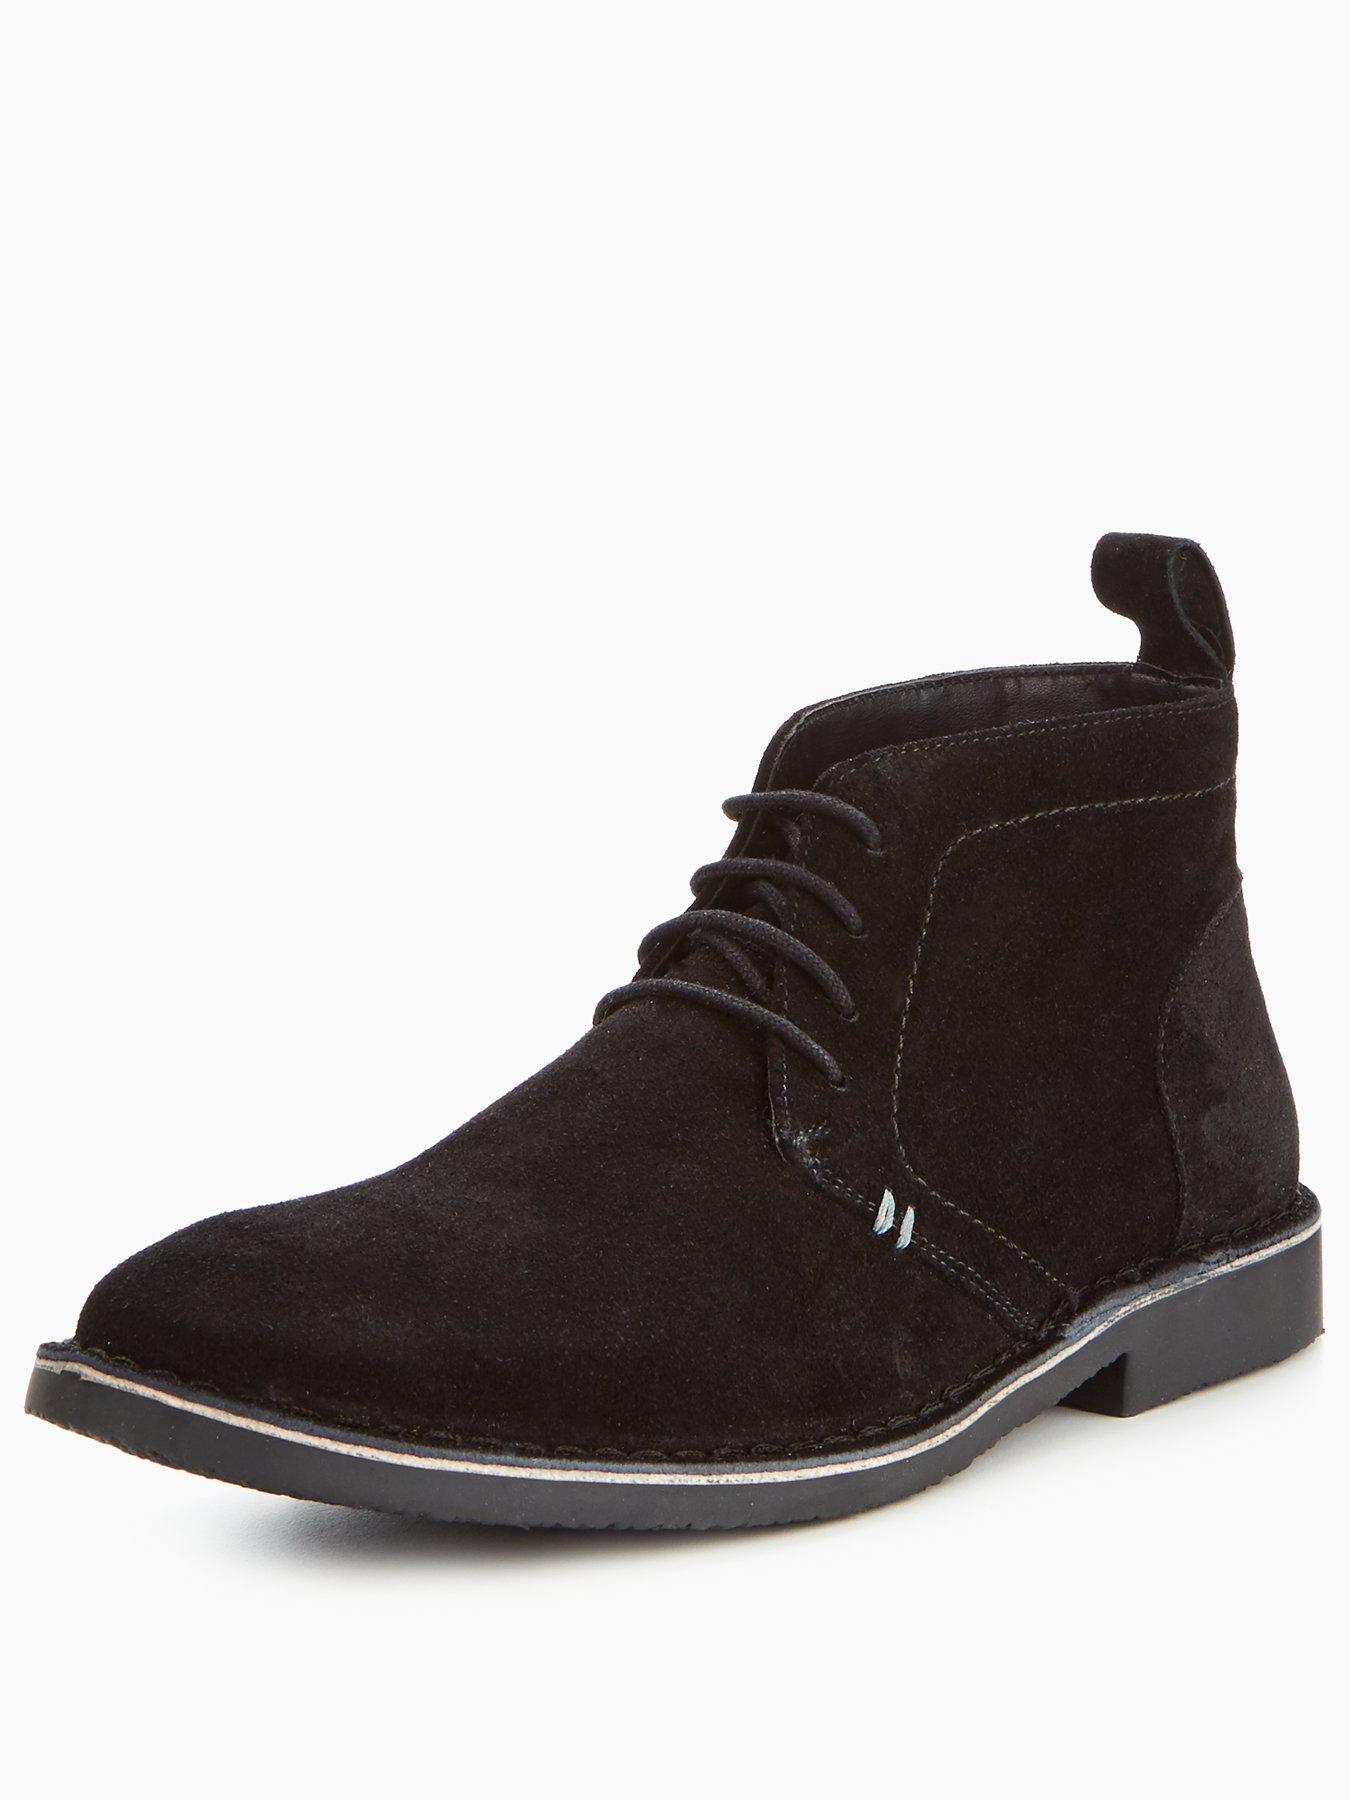 Latest Unsung Hero Warwick Suede Black Boots for Men Online Sale